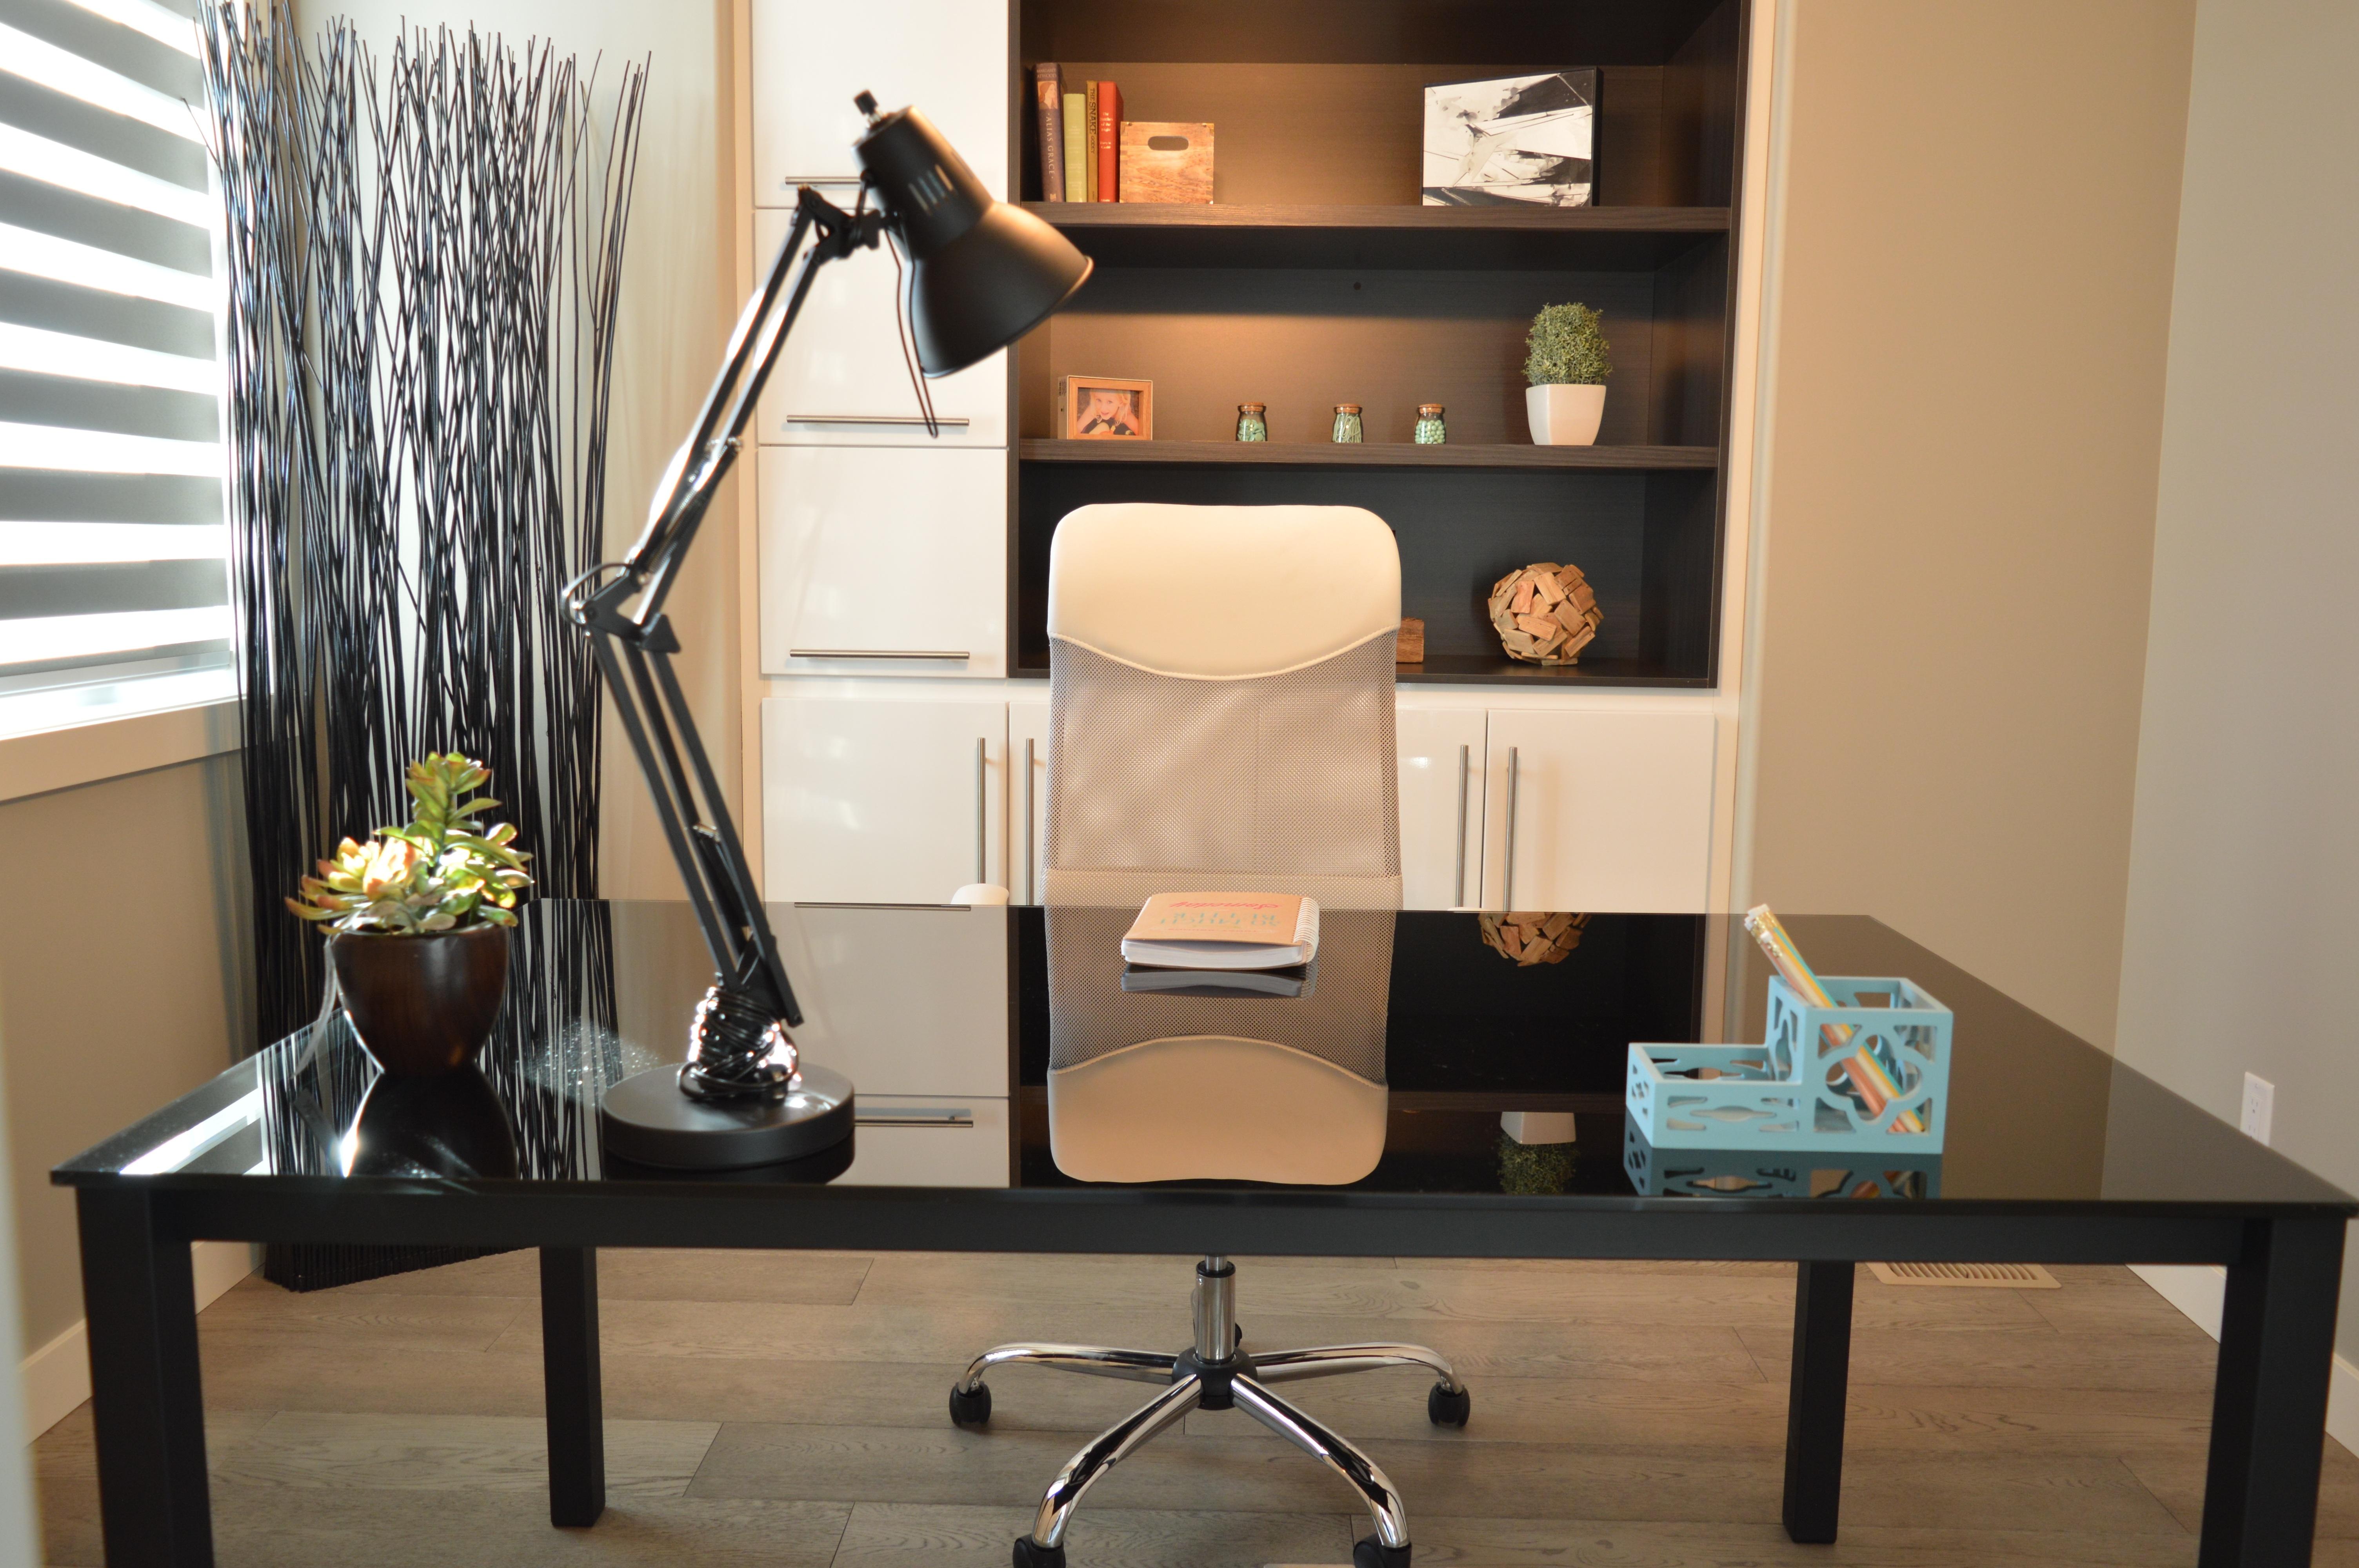 office-home-house-desk-159839 2.jpeg